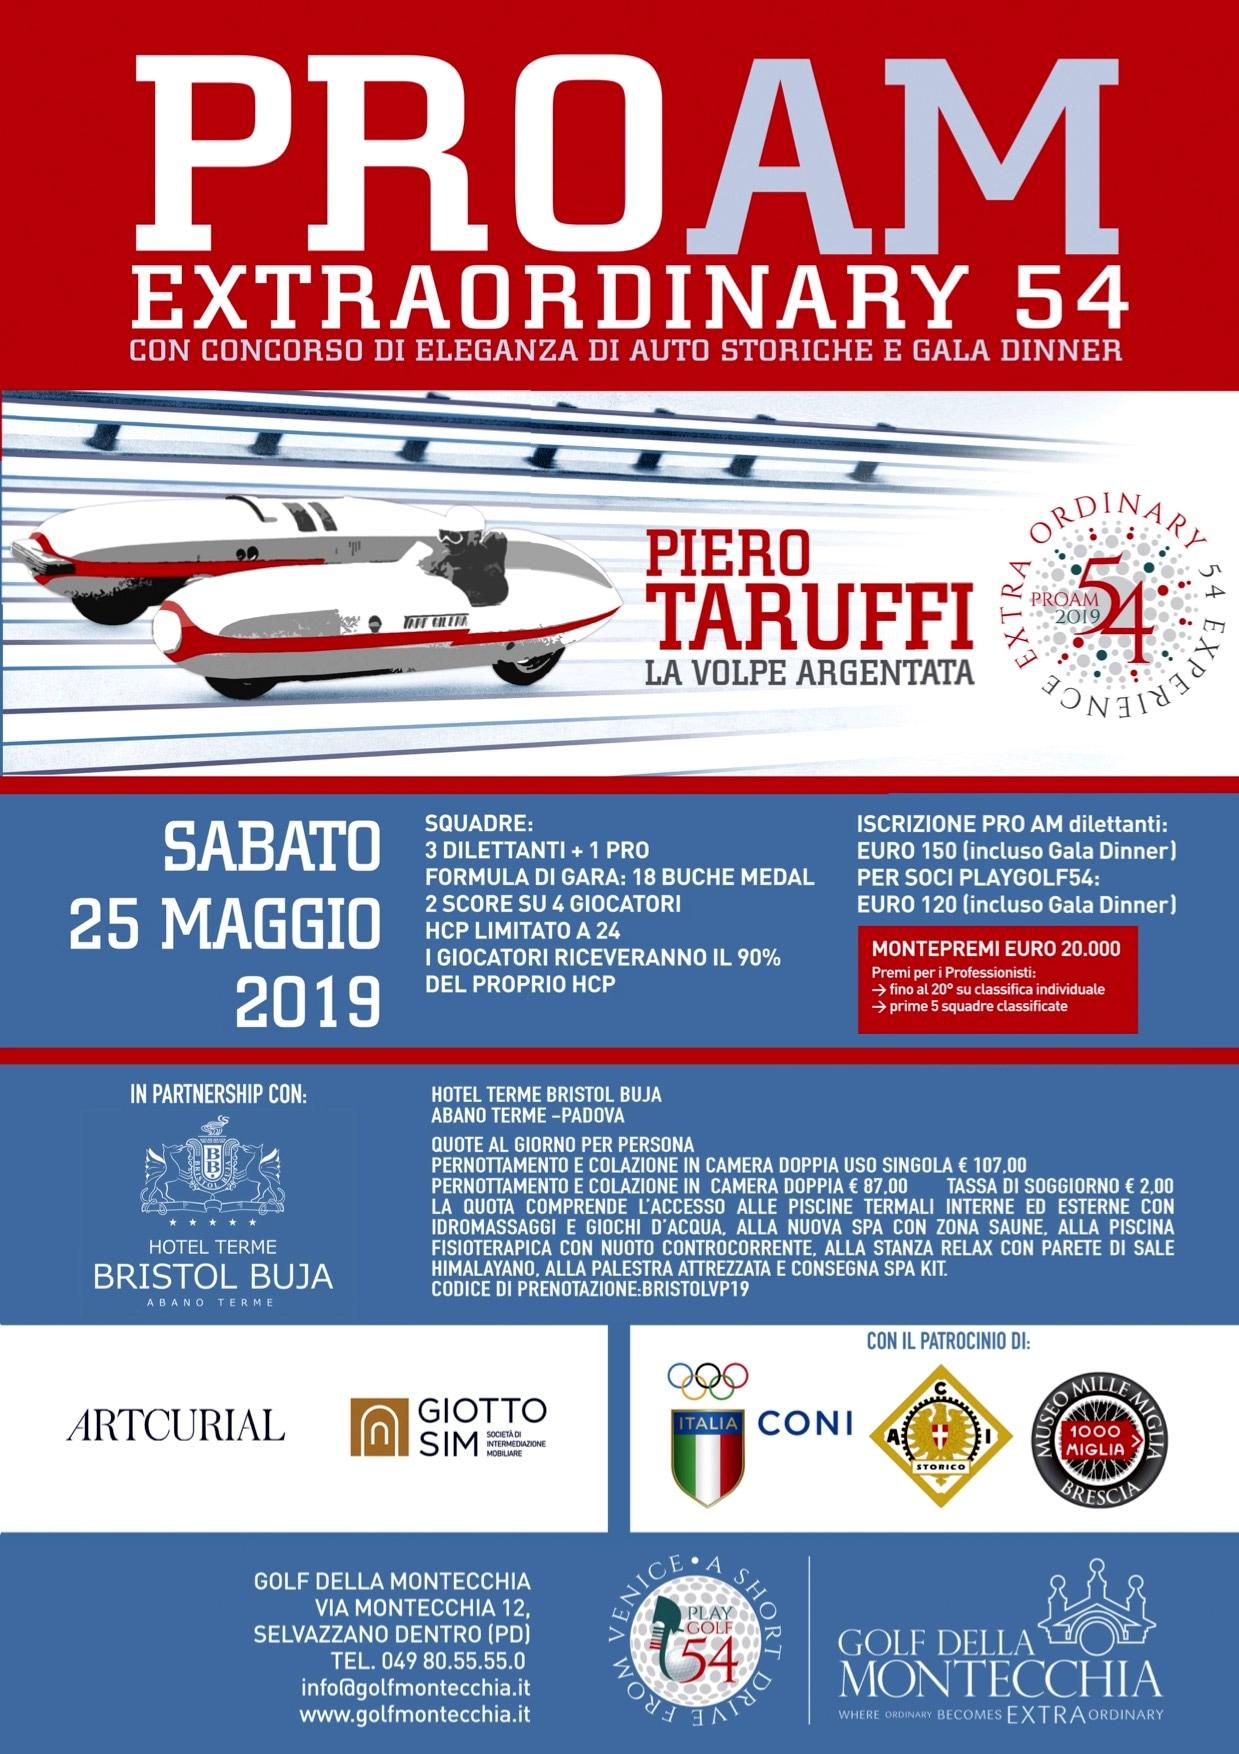 Locandina-proam-VolpeArgentata_2019-2